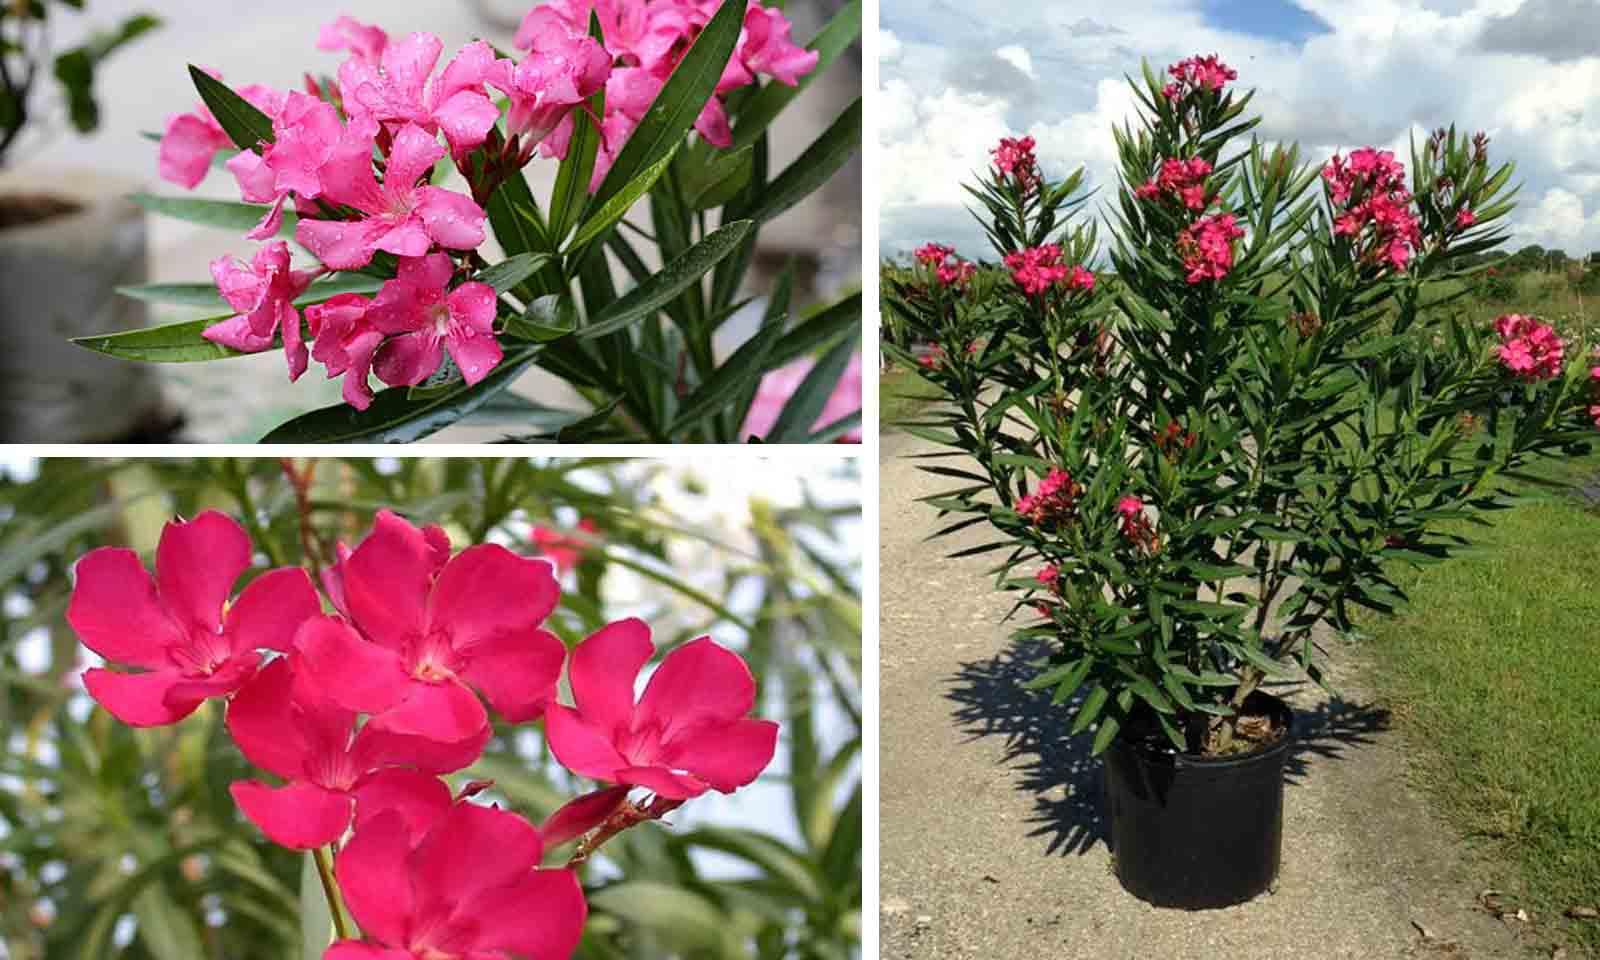 Nerium Oleander (East Indian Oleander) - Shrub